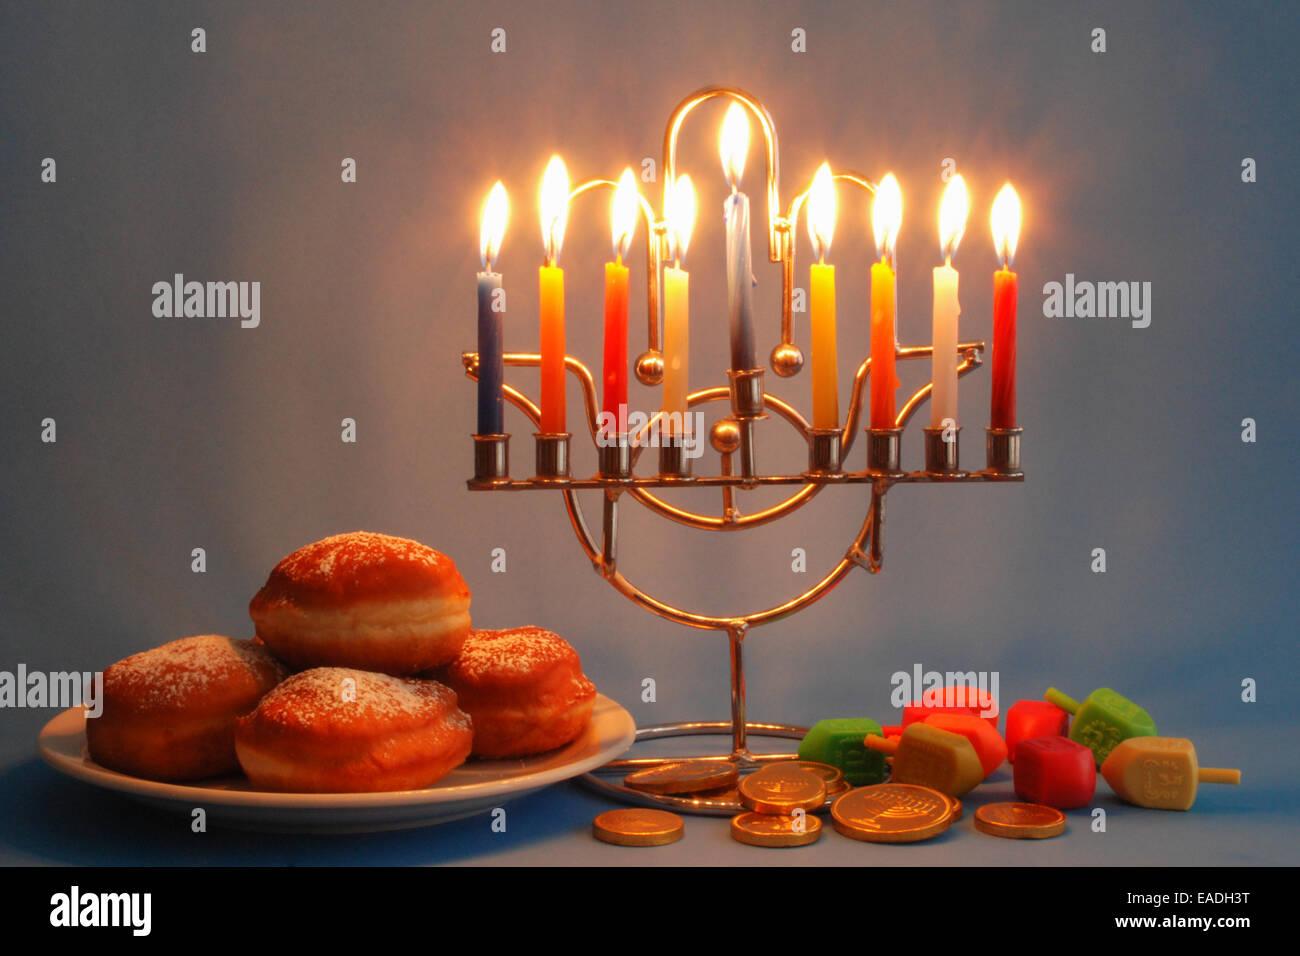 Symbols Of Hanukkah Holyday Menorah With Candles Donuts Dreidels